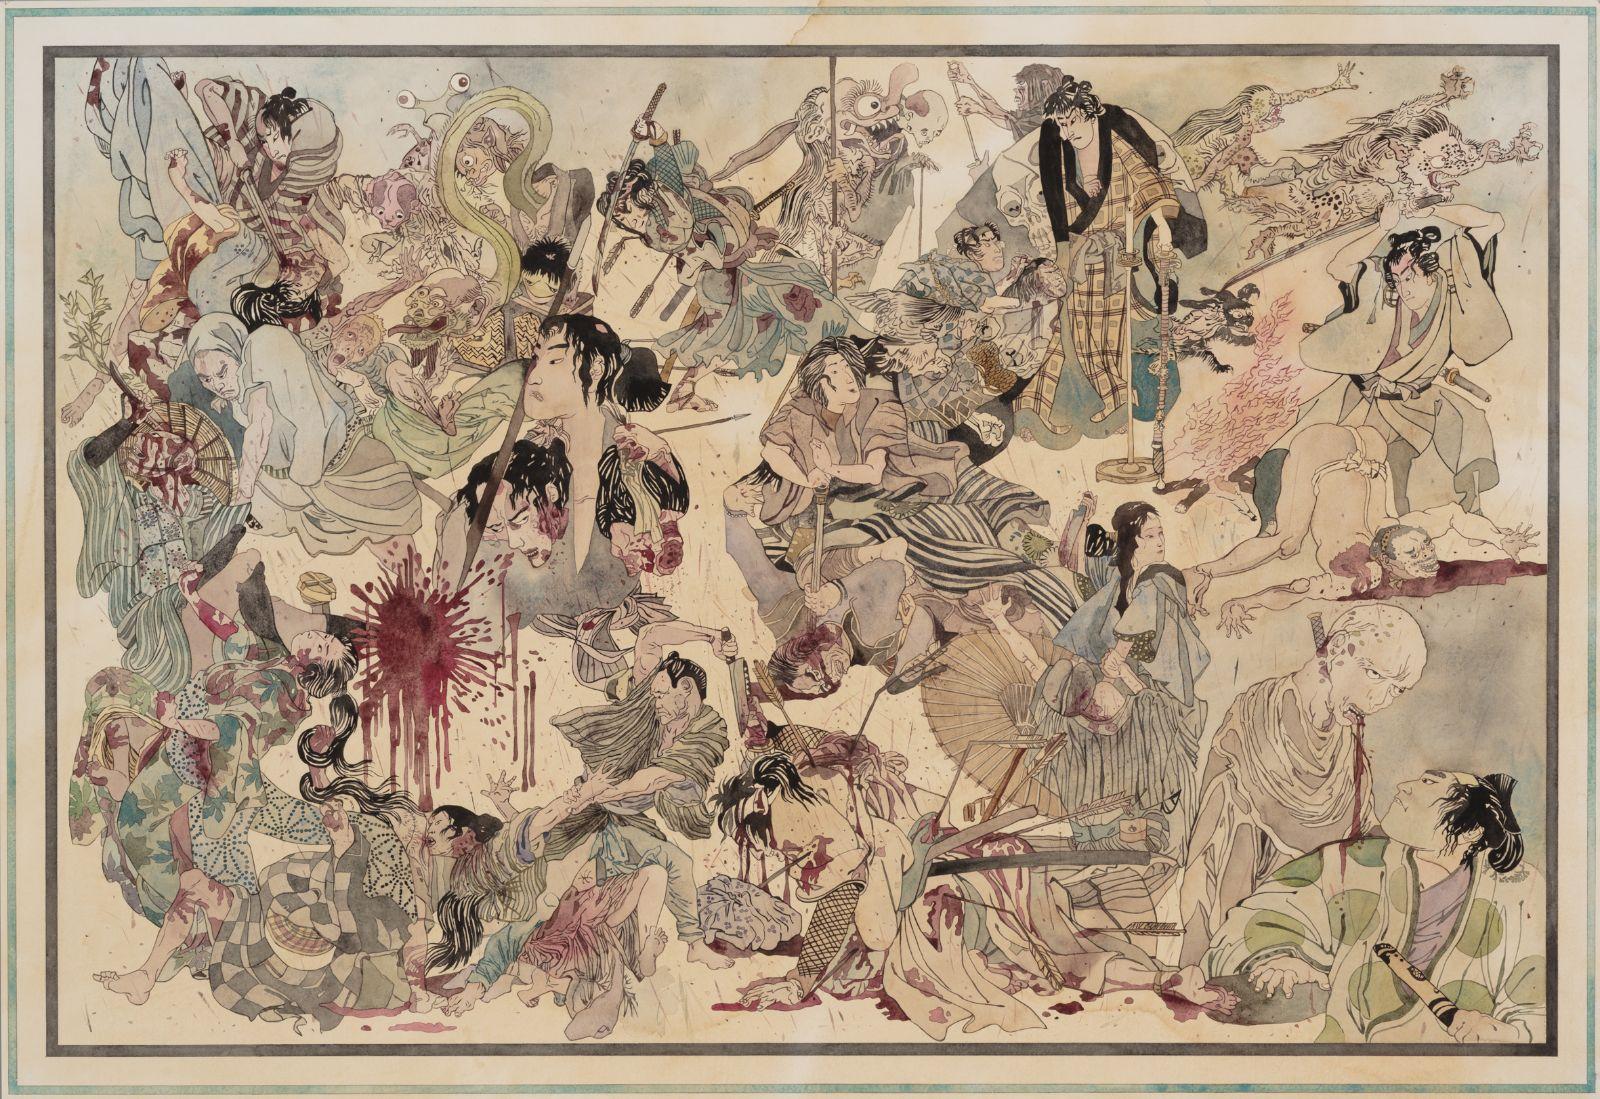 Kshatriya, 2014, watercolour paper, 67 x 98 cm